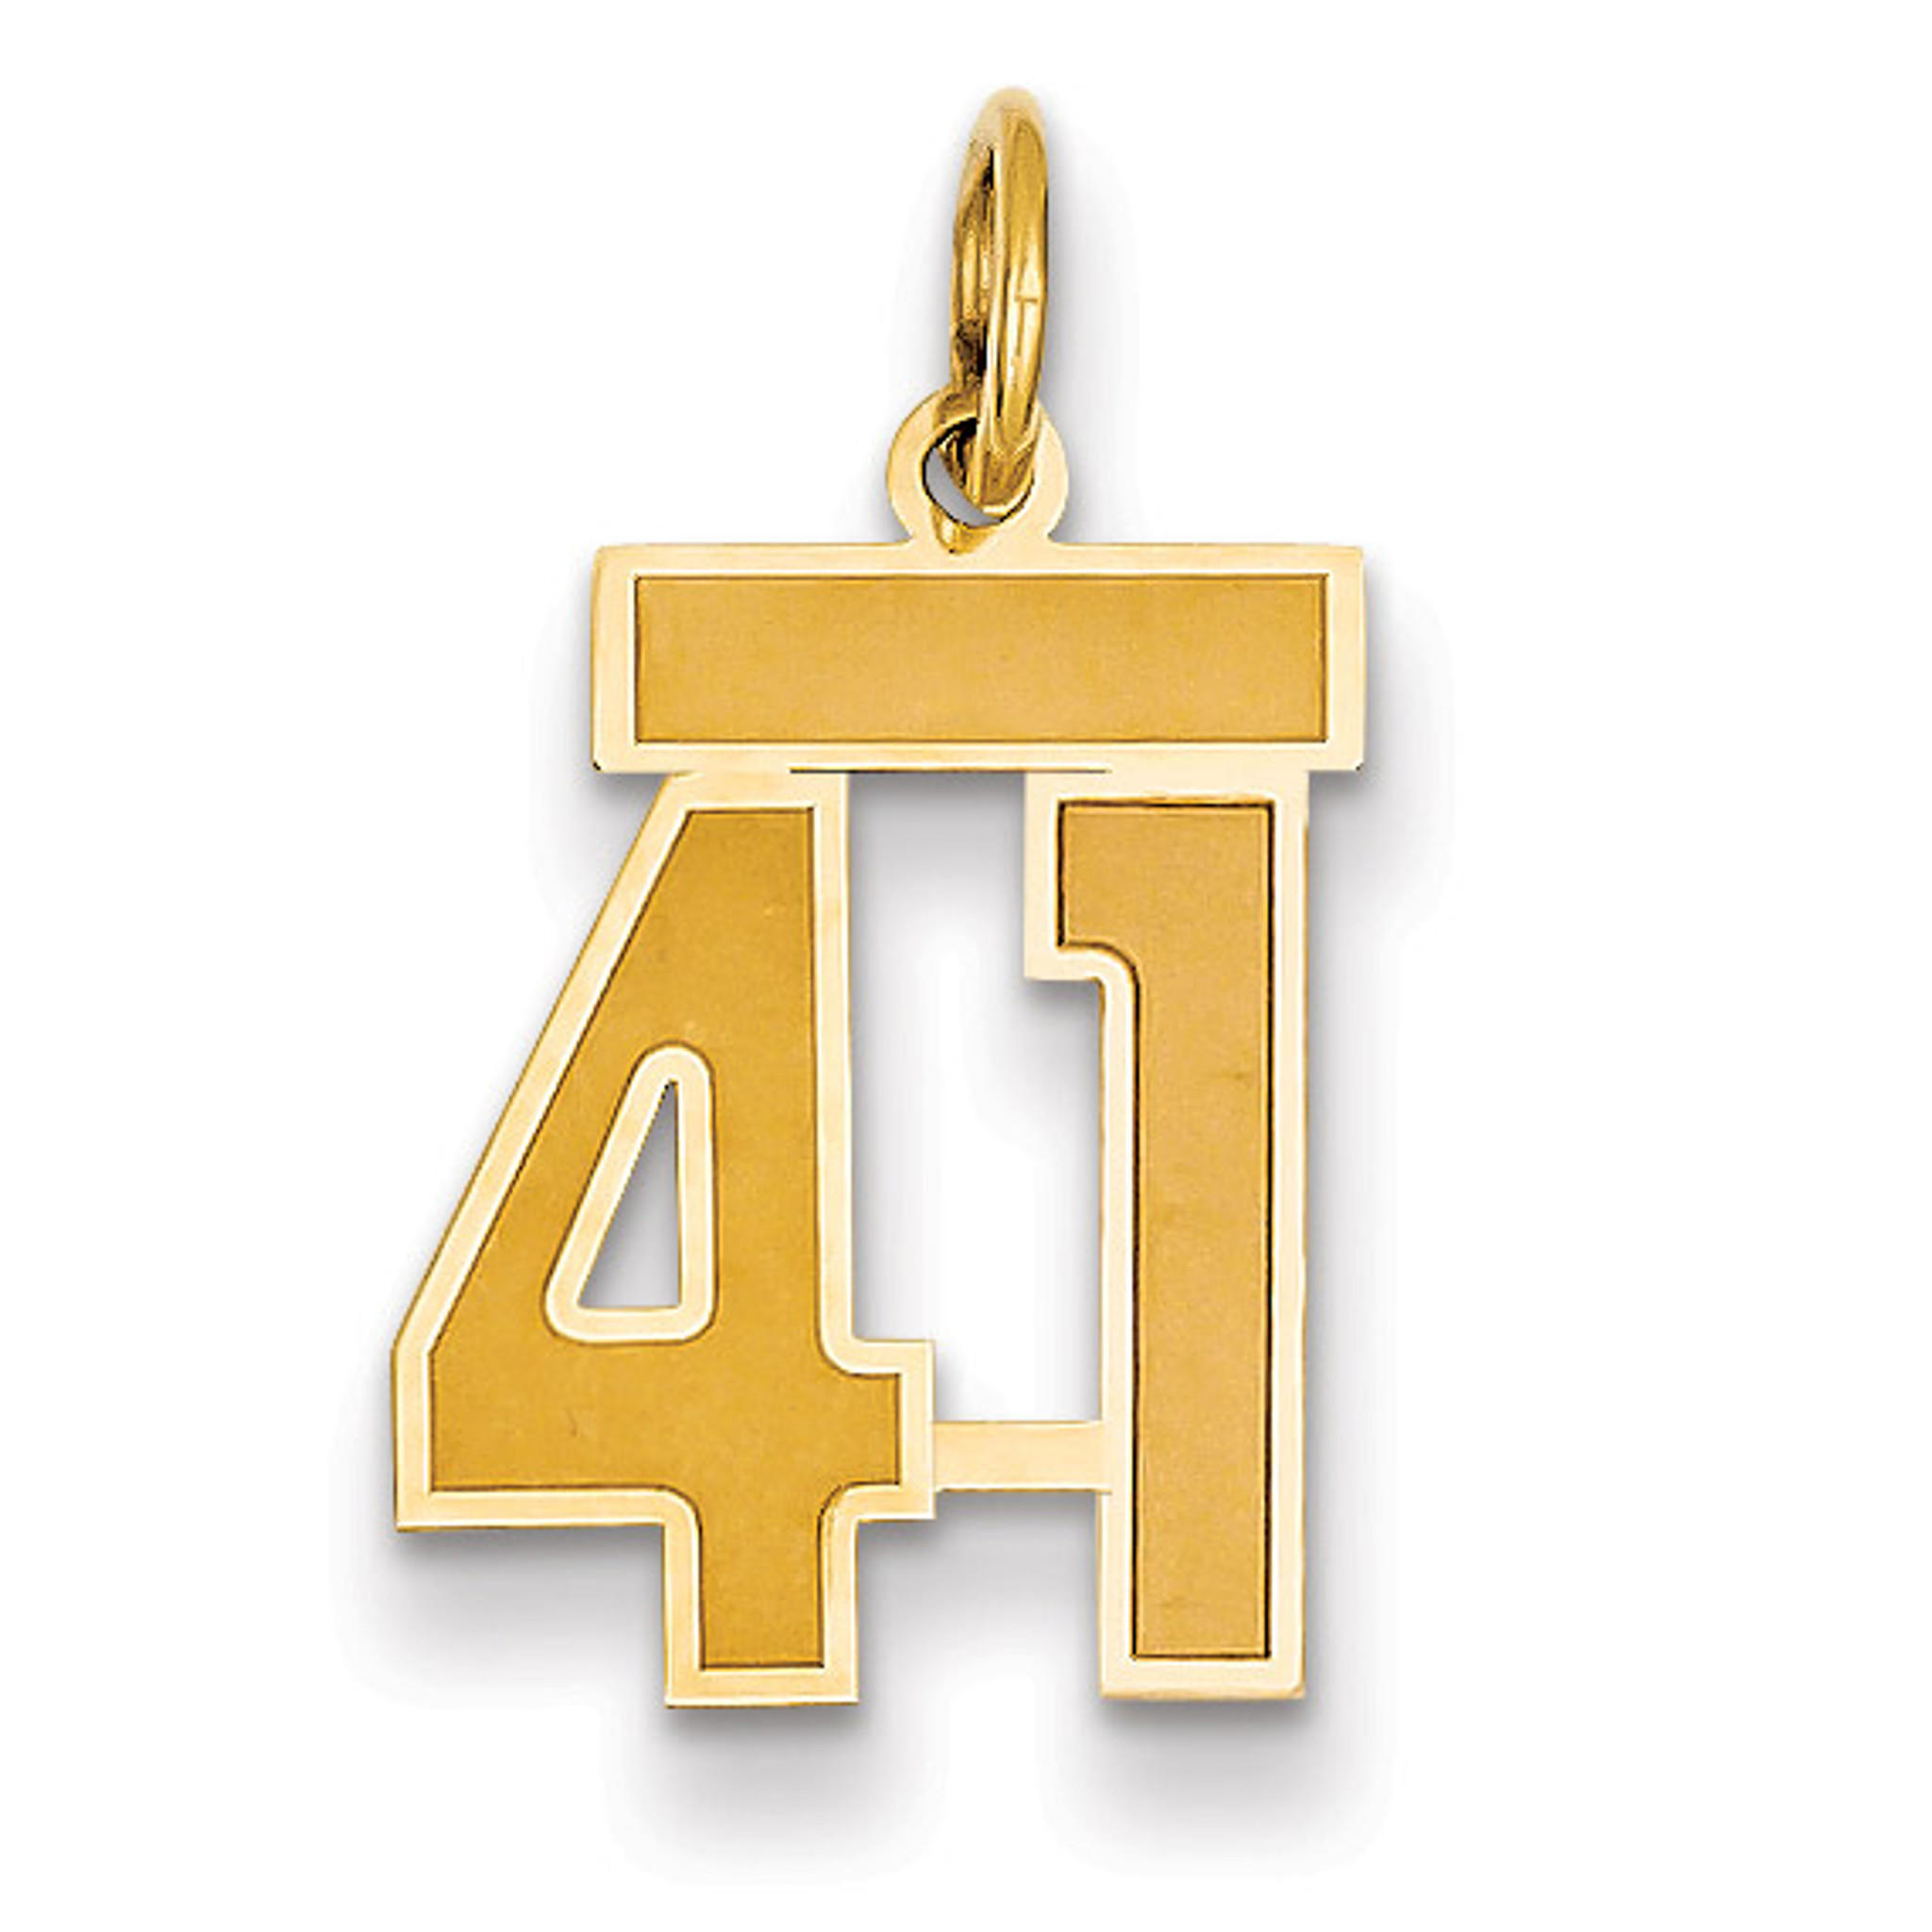 14K White Gold Hawaii Pendant 22 mm Jewels Obsession Hawaii Charm Pendant